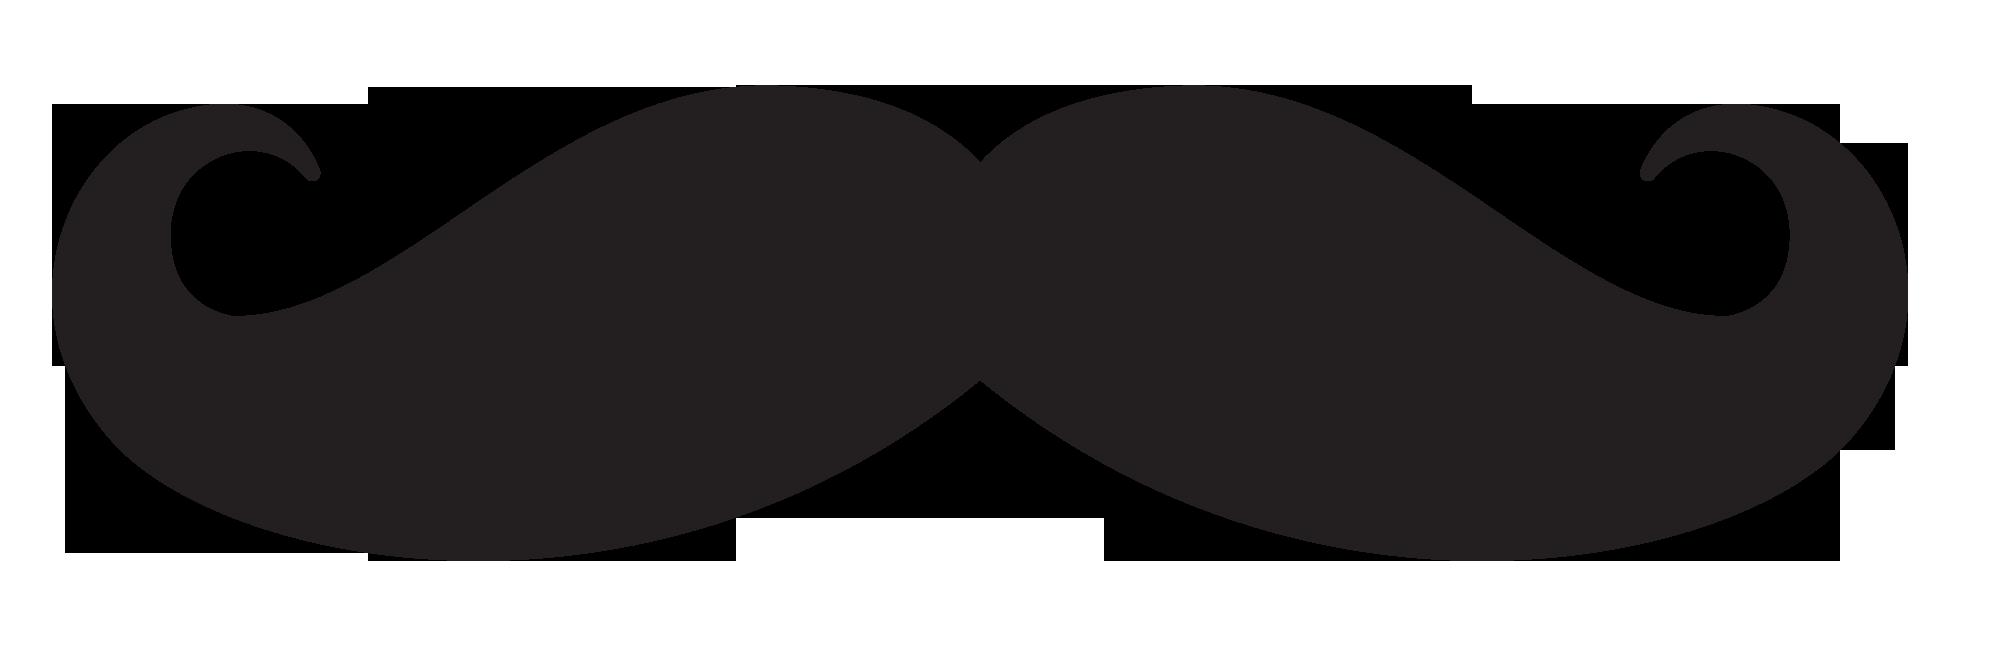 was bedeutet dieser mustache bedeutung symbol moustache. Black Bedroom Furniture Sets. Home Design Ideas